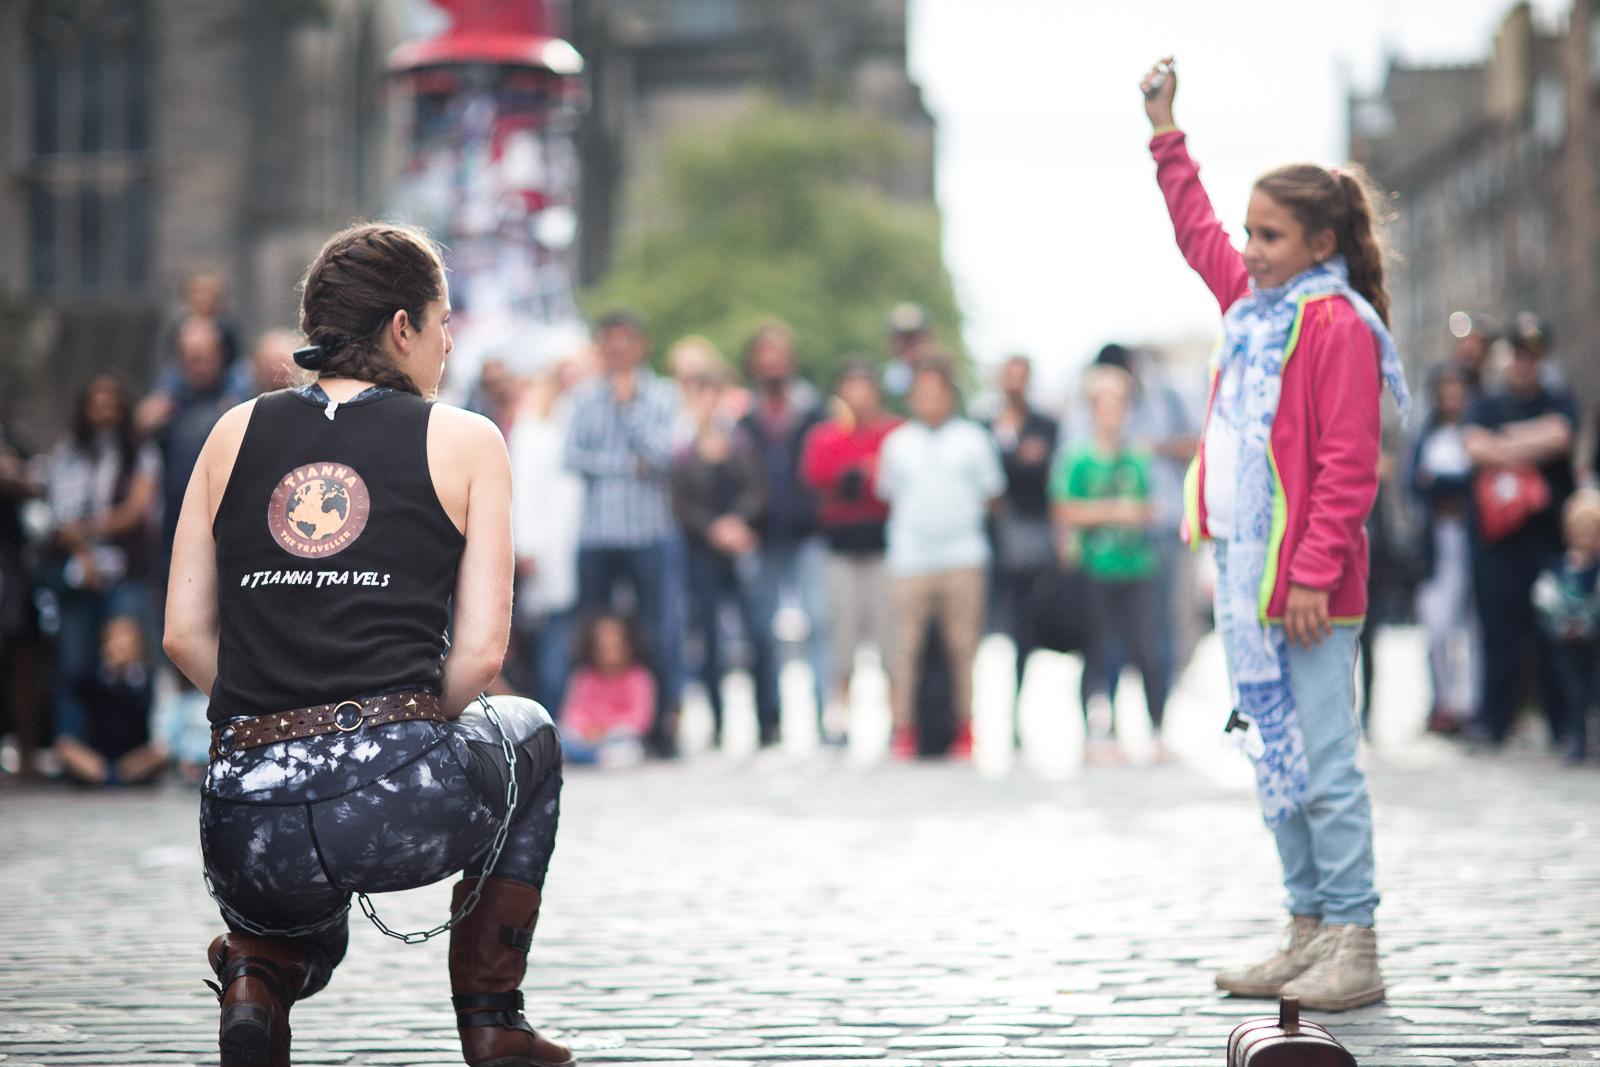 Edinburgh Festival Fringe, Scotland